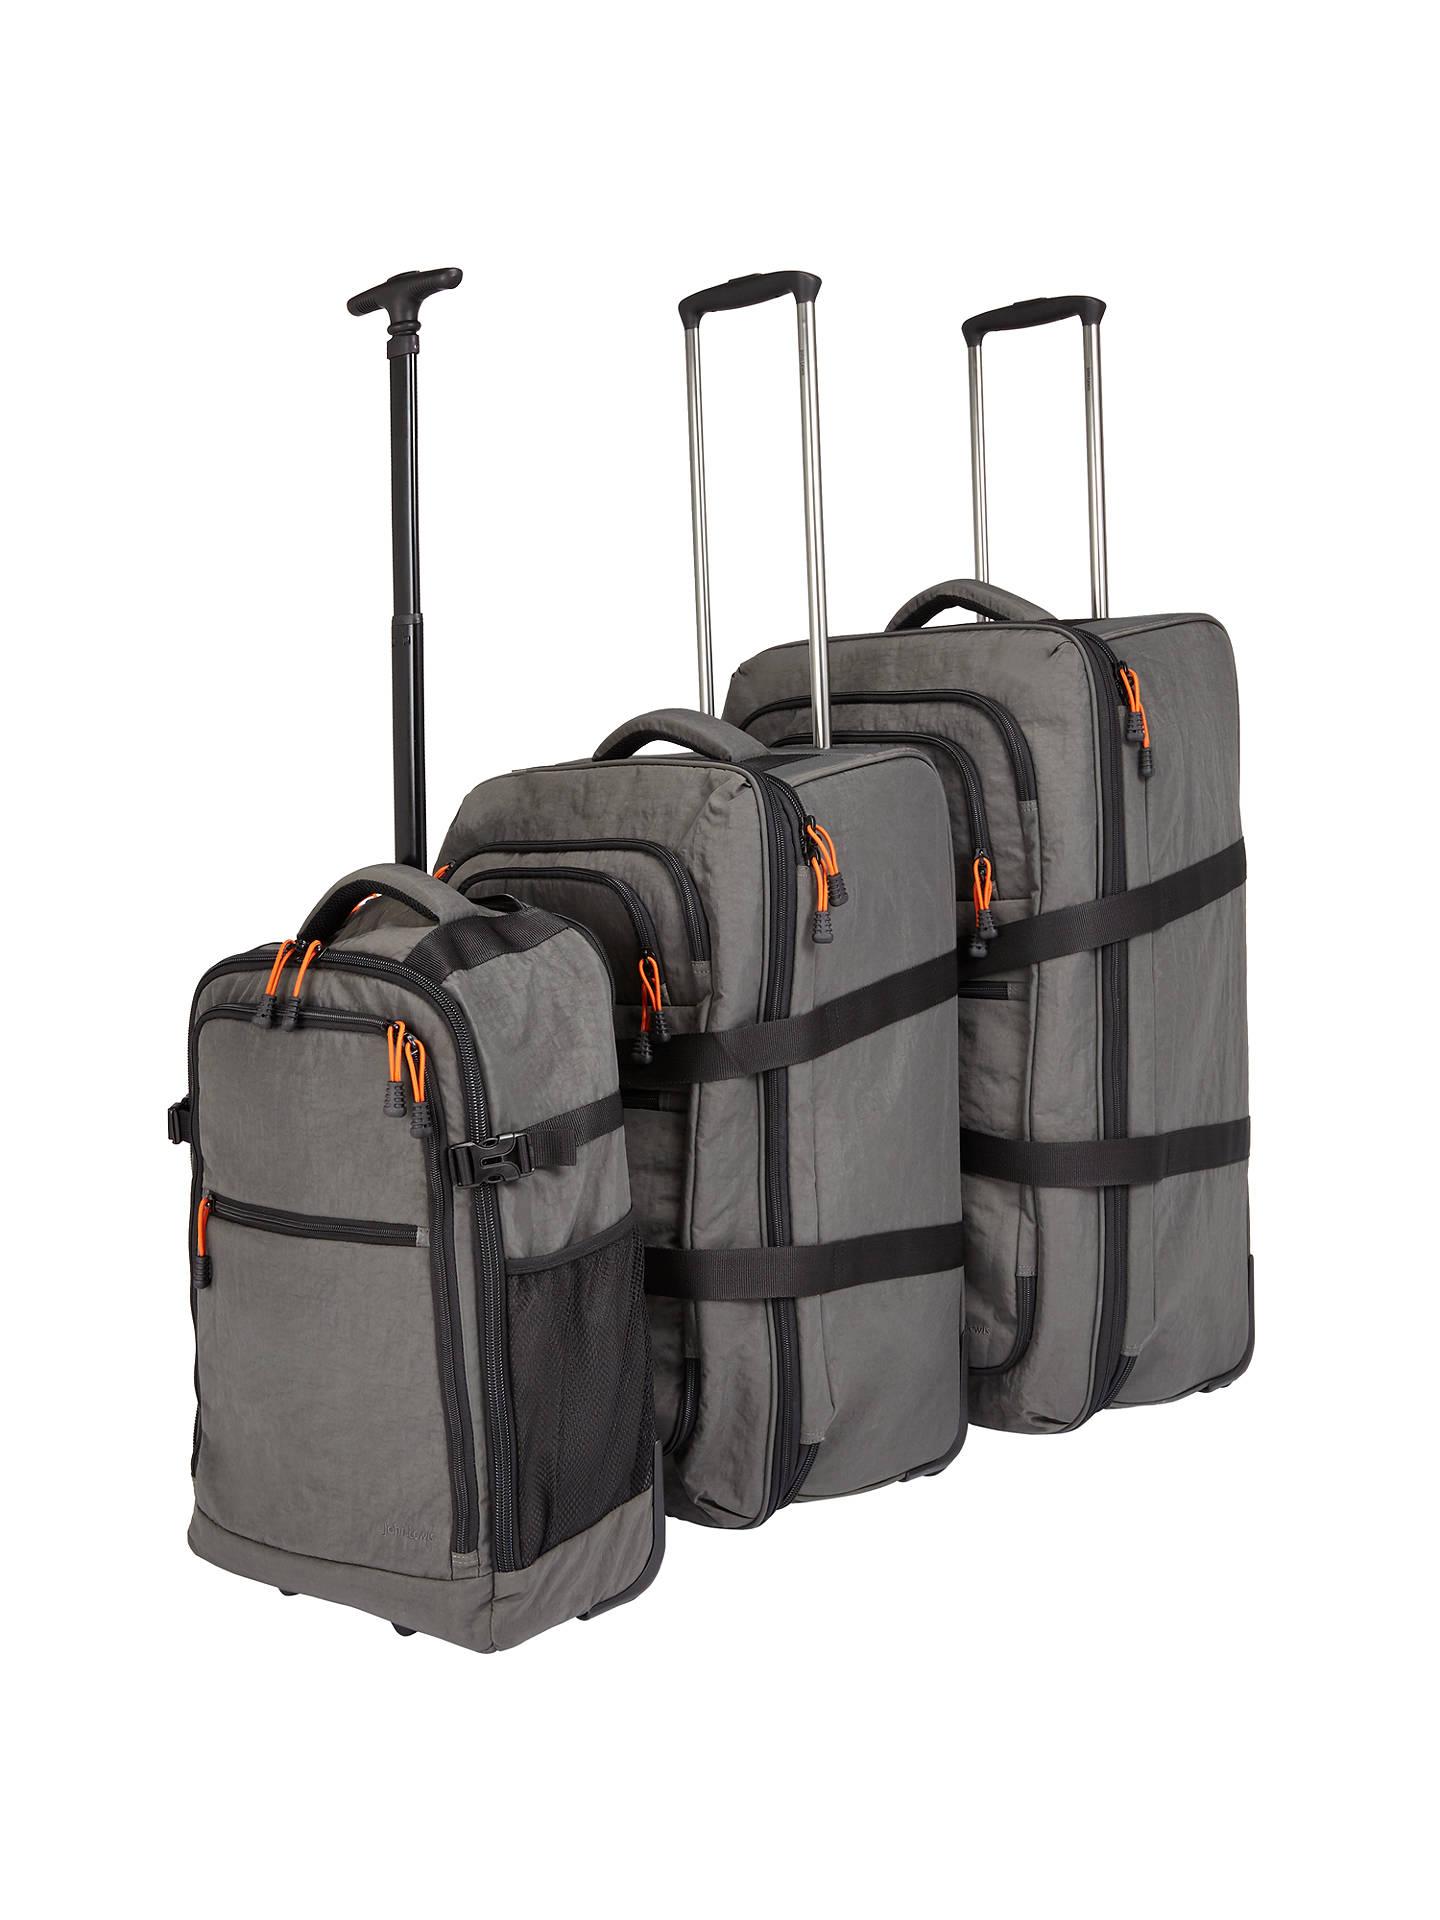 b4356490dffe John Lewis & Partners Trail Wheelend Backpack Cabin Case, Charcoal